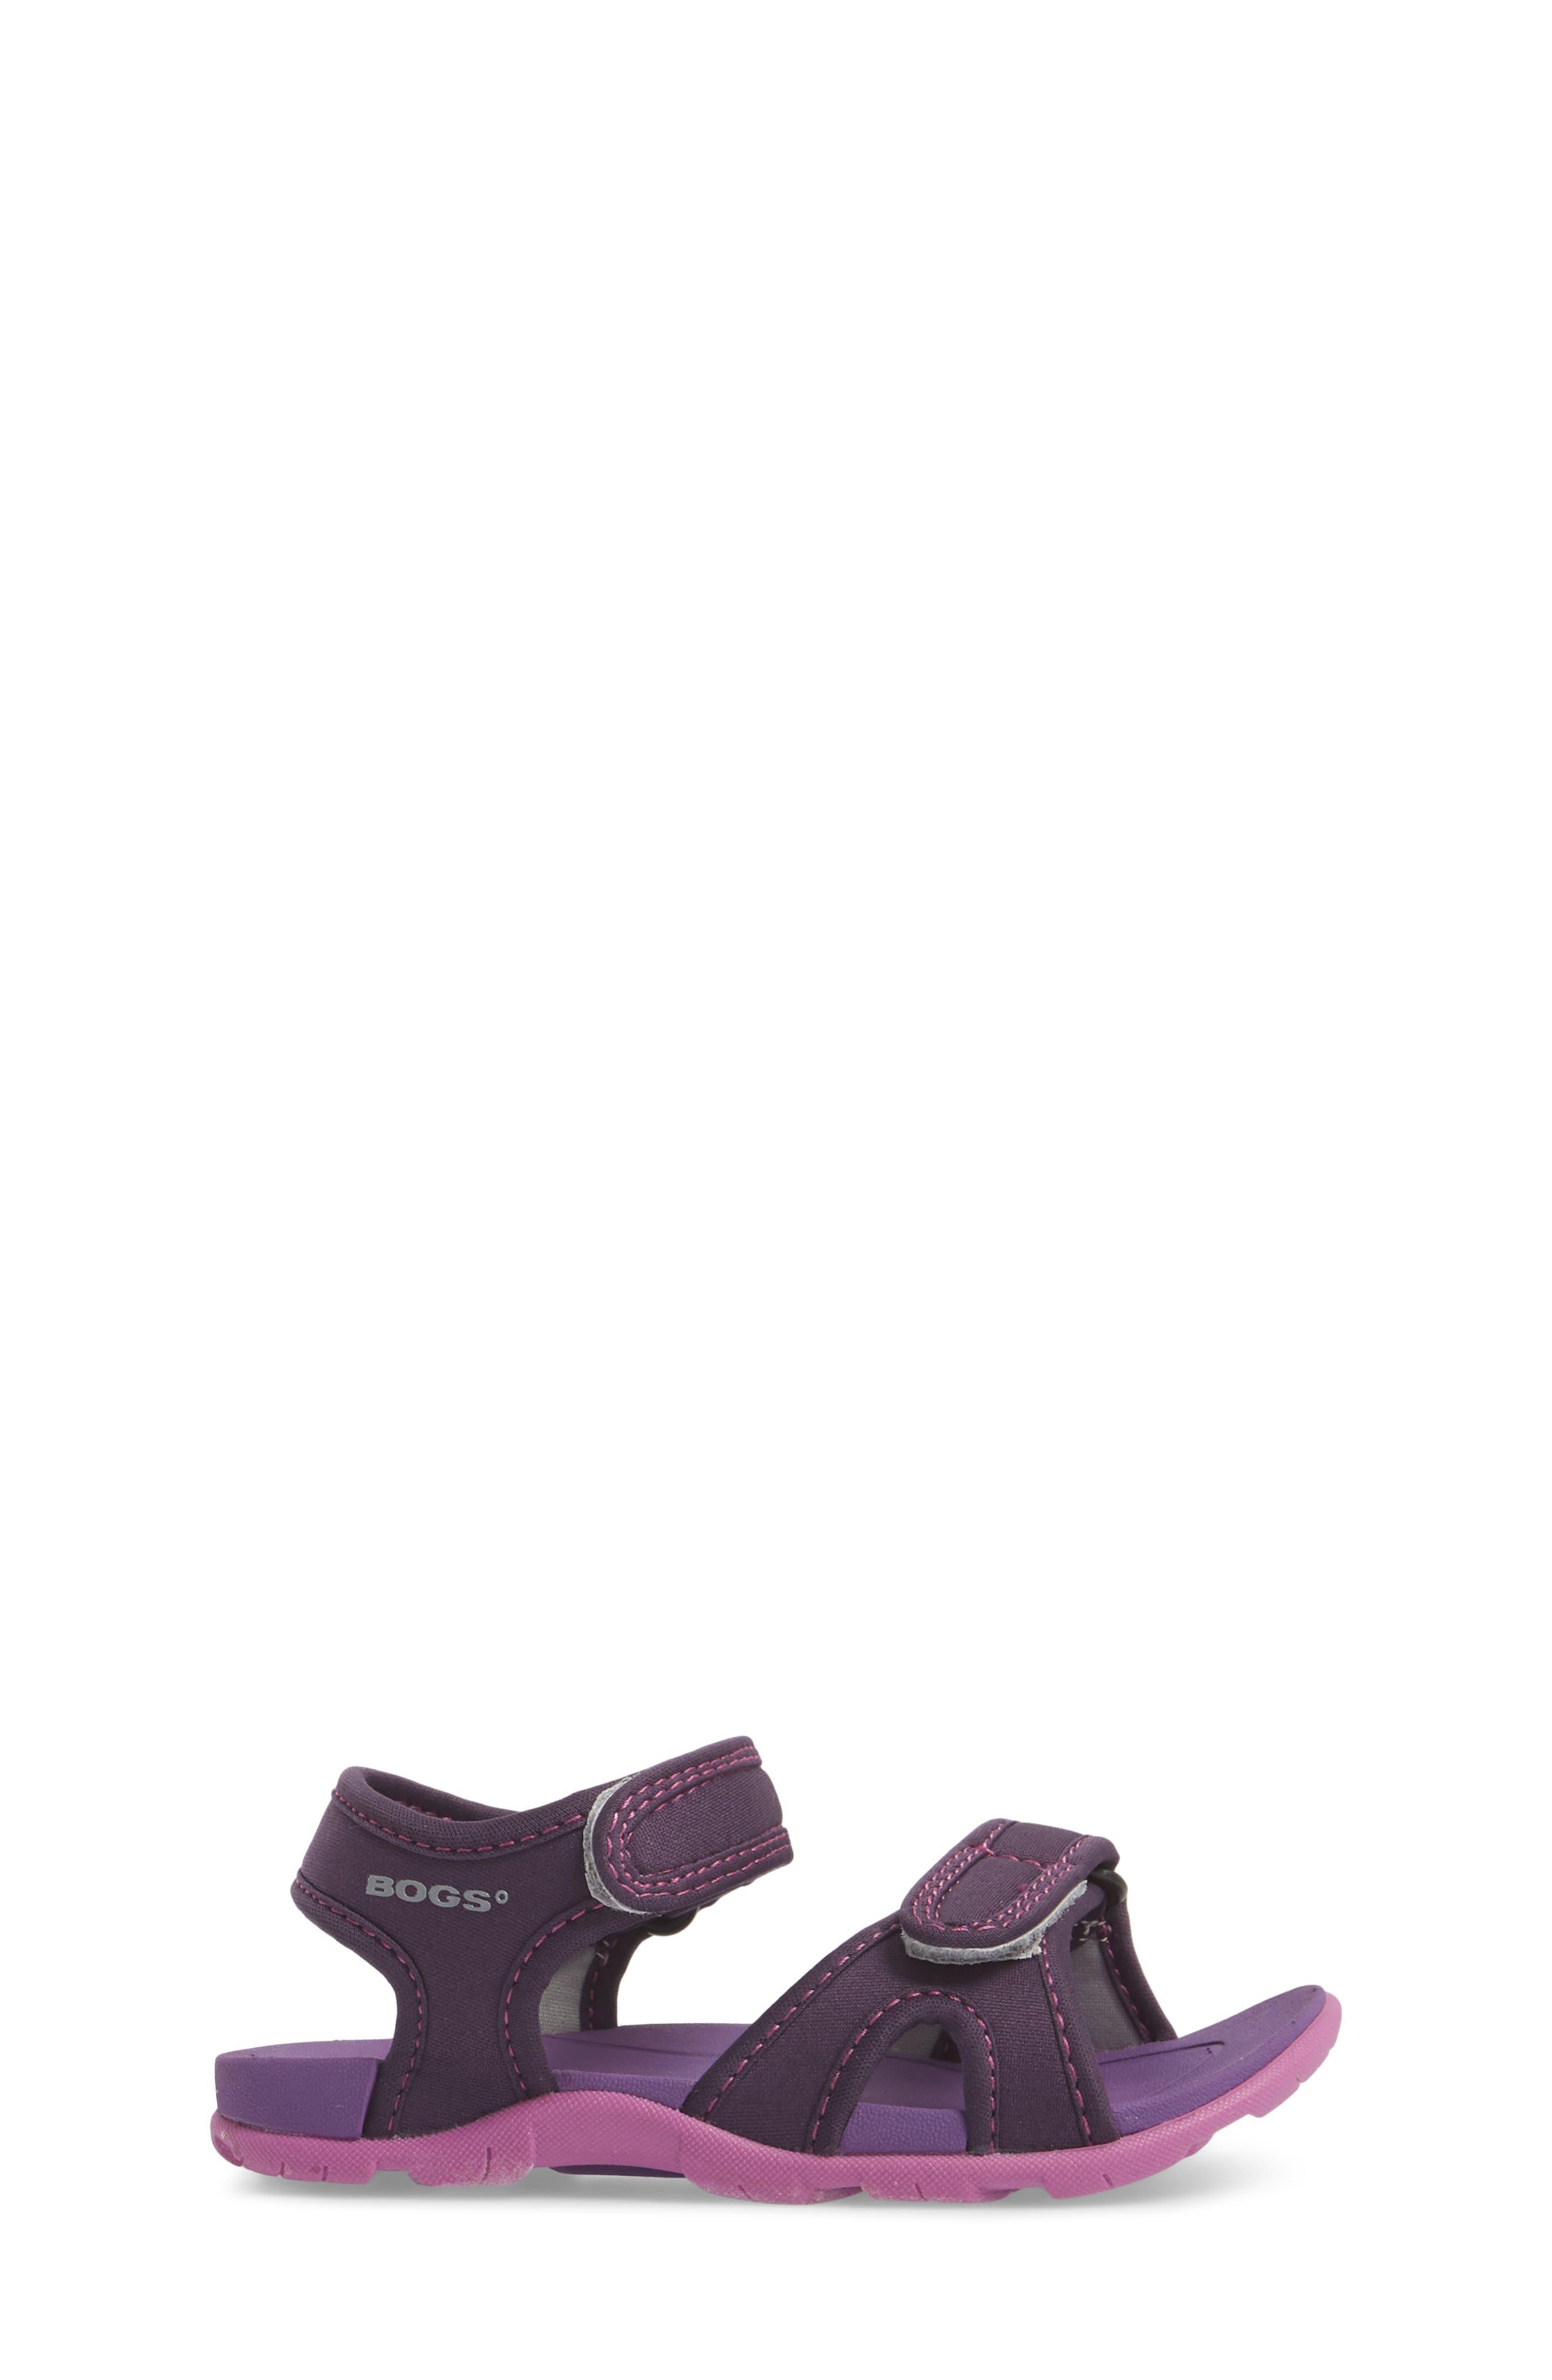 Whitefish Waterproof Sandal,                             Alternate thumbnail 3, color,                             Eggplant Multi